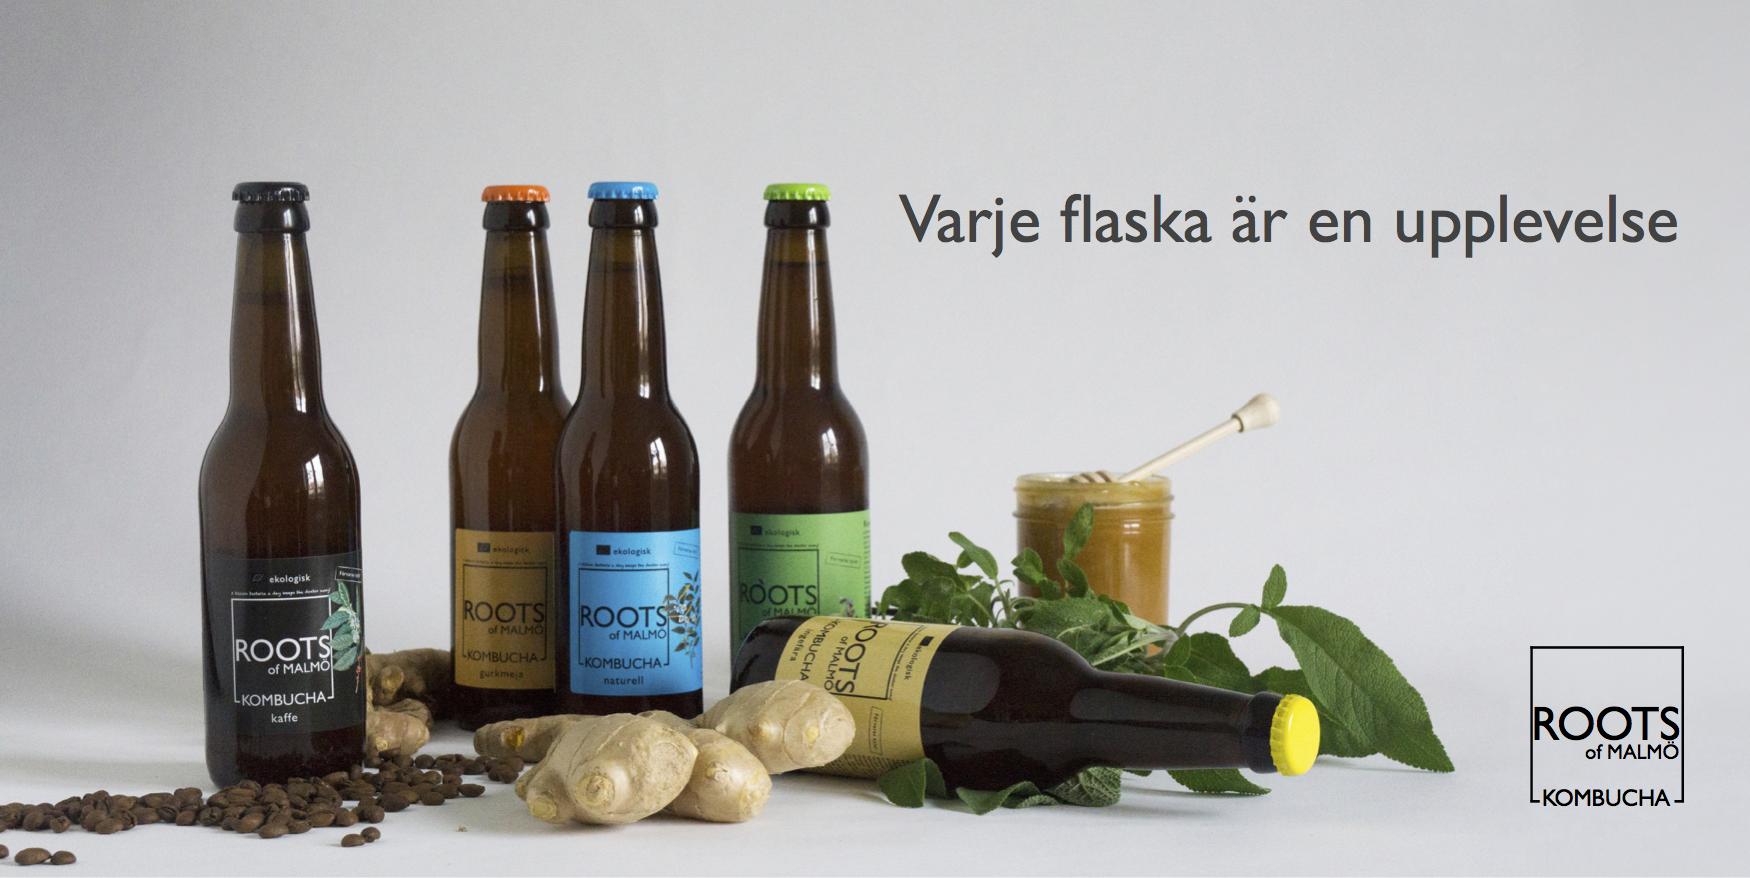 Roots of Malmö, Alkoholfritt